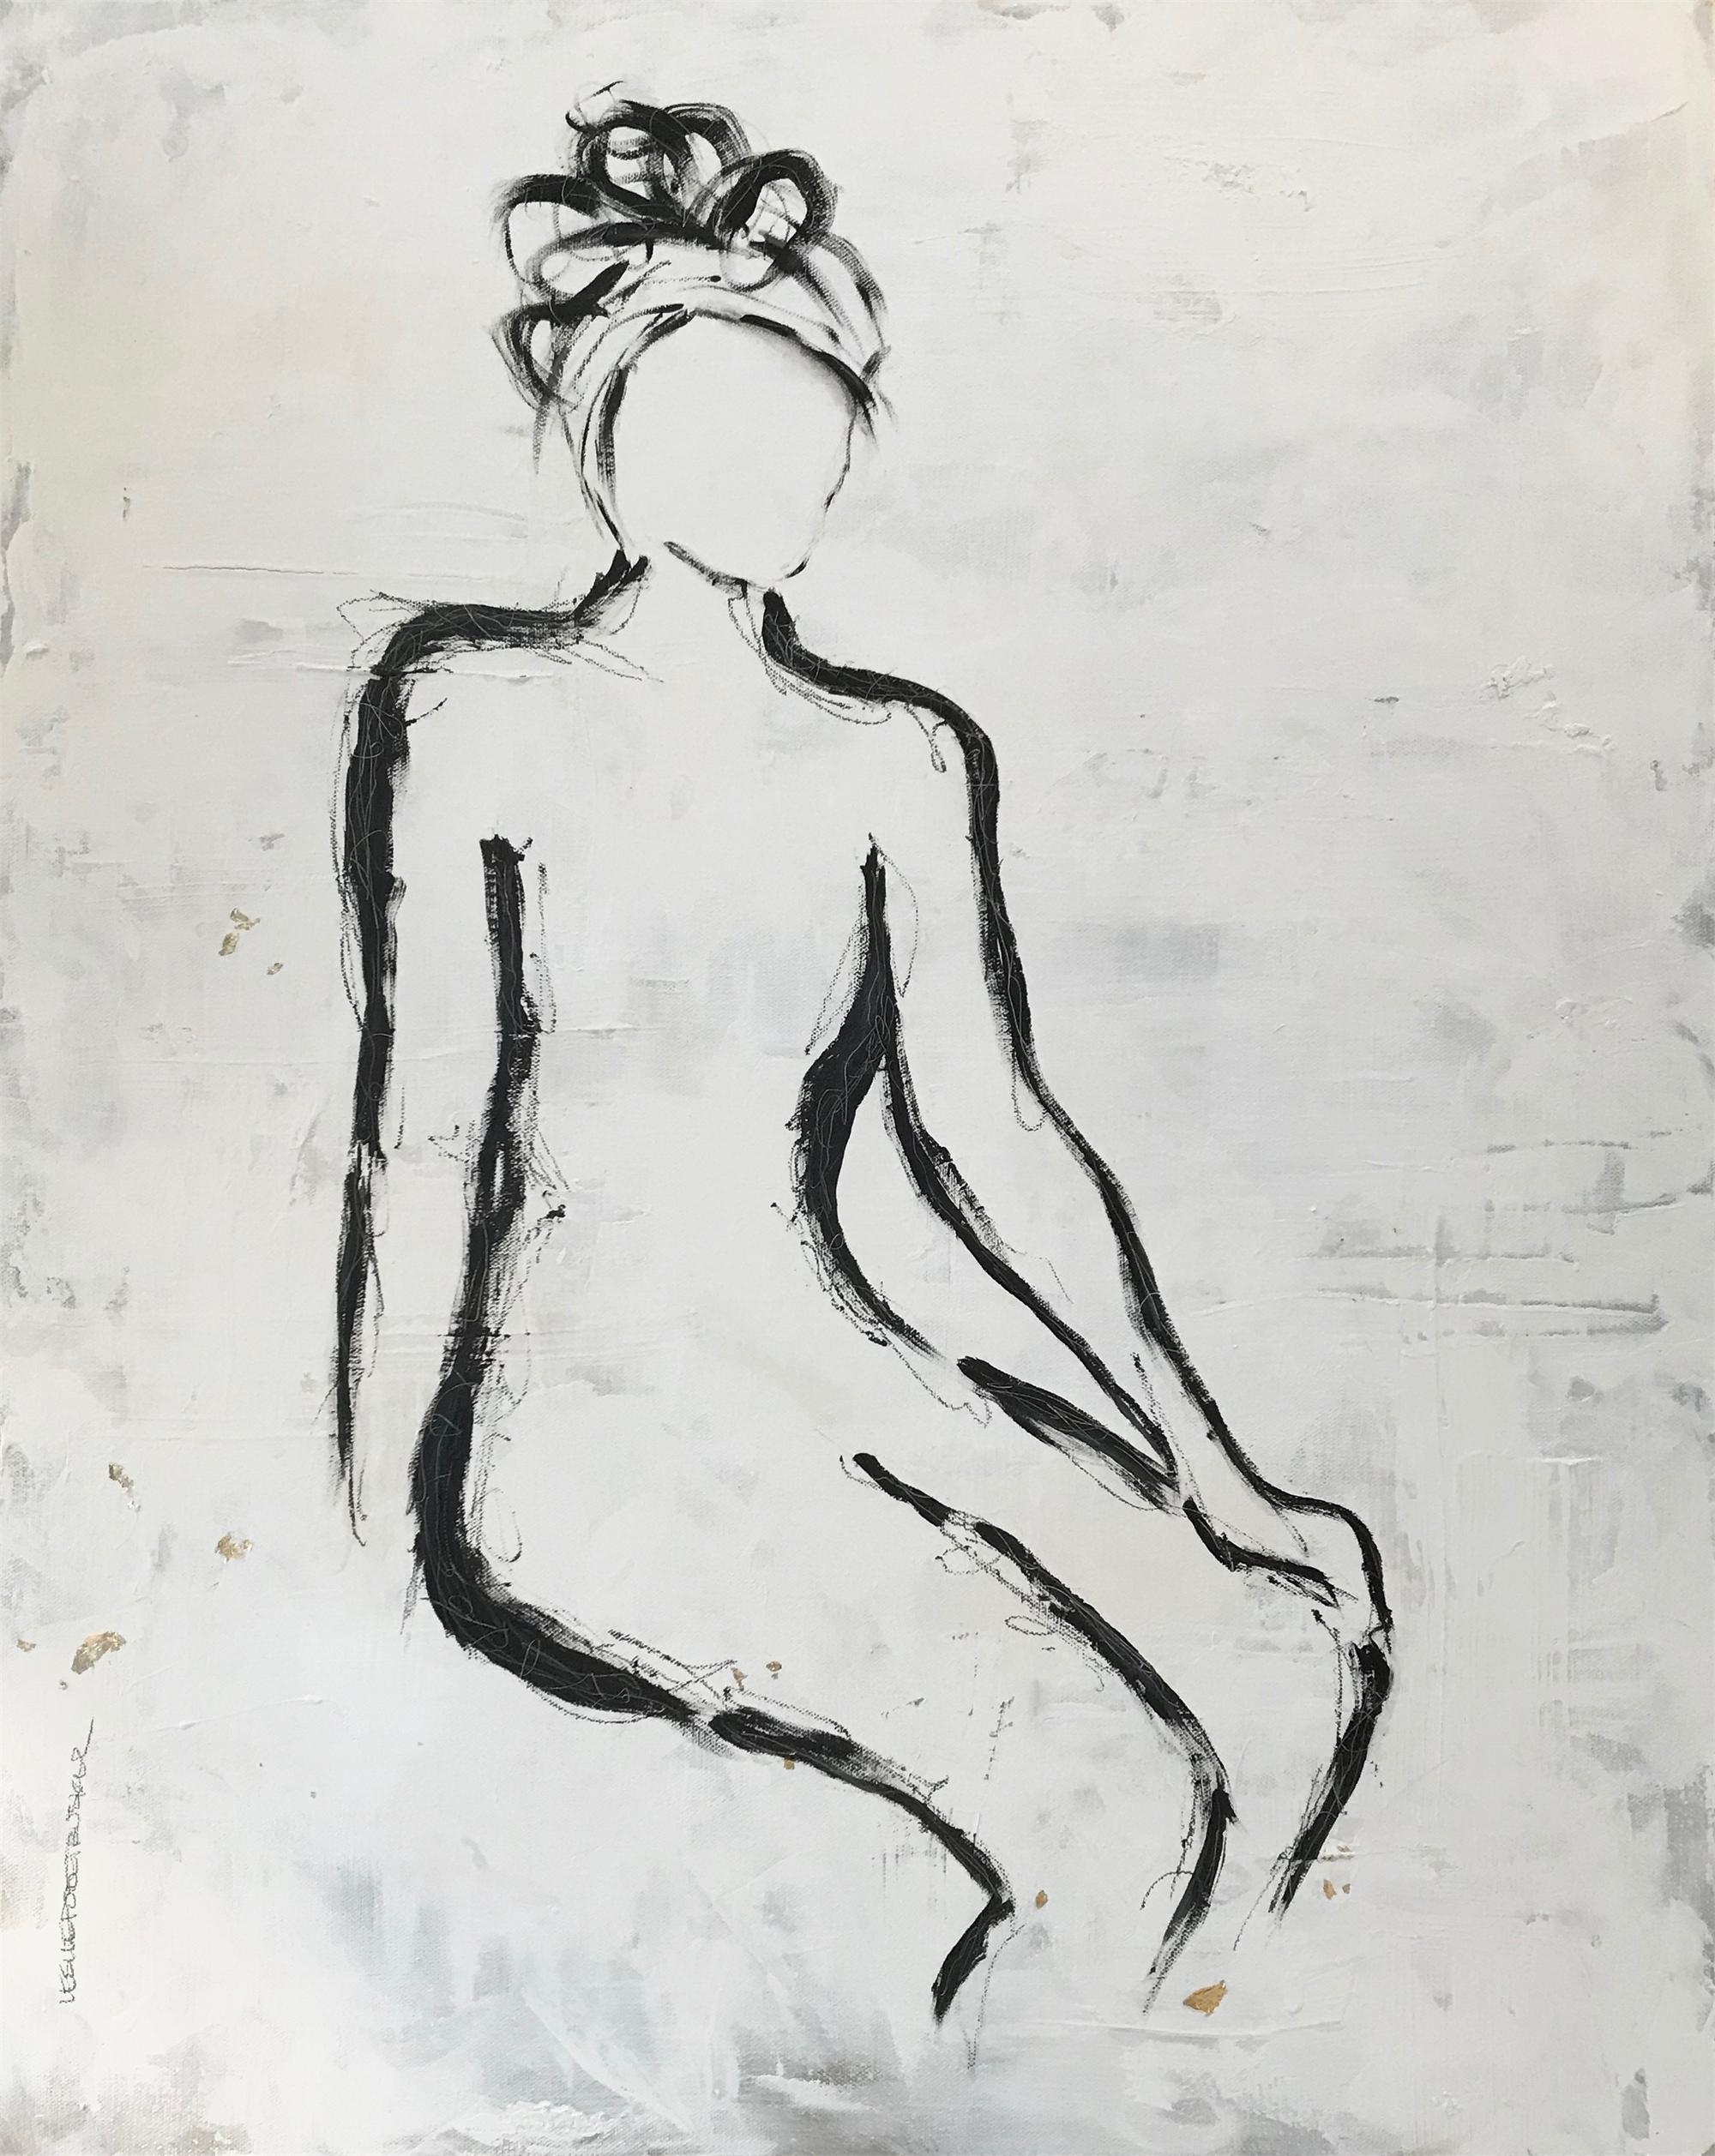 Figure No. 129 by Leslie Poteet Busker